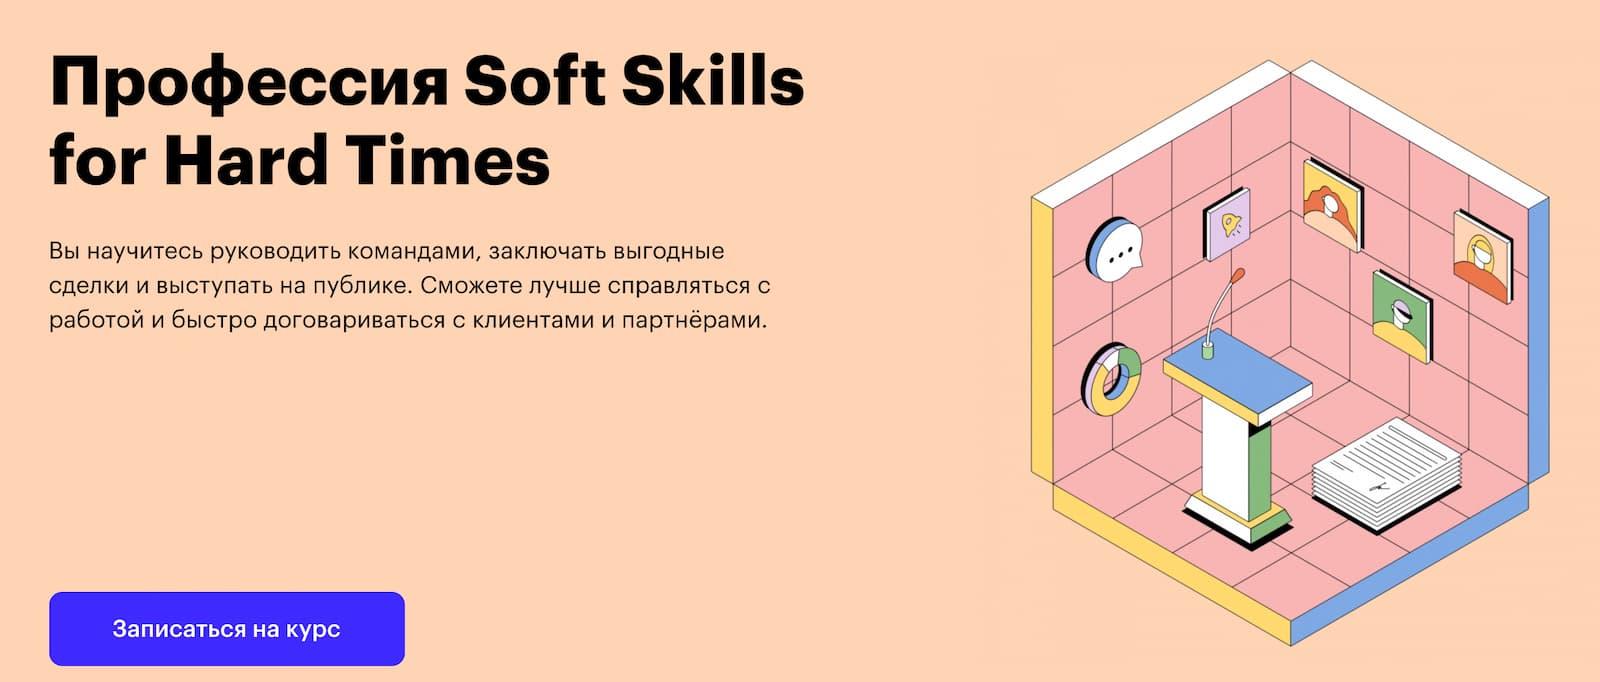 Записаться на курс «Soft skills for hard times» от Skillbox